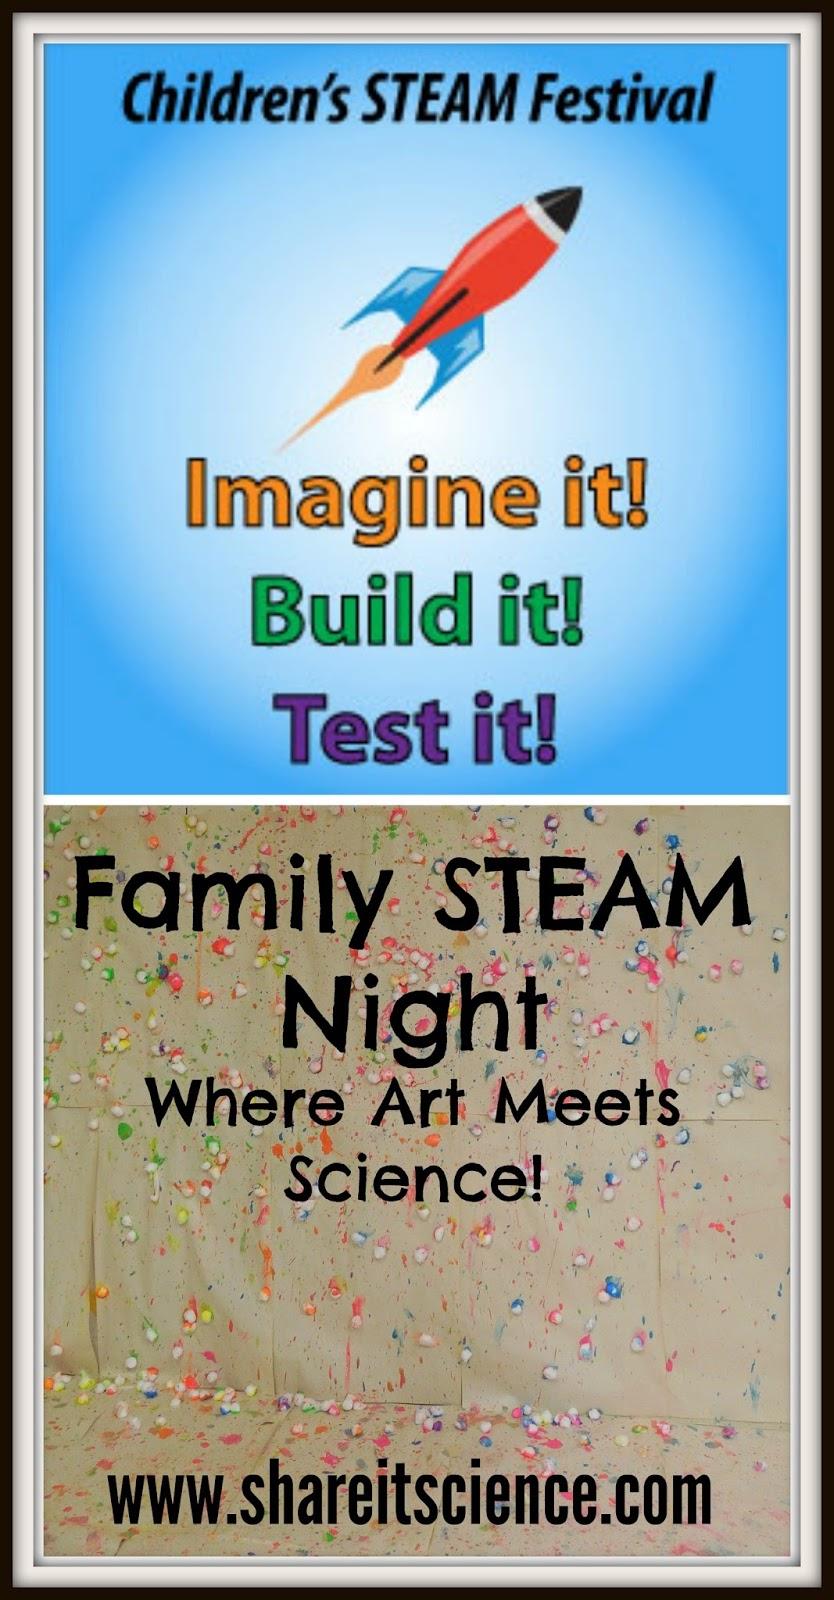 Share it! Science : Children's STEAM Festival: Family STEAM Night